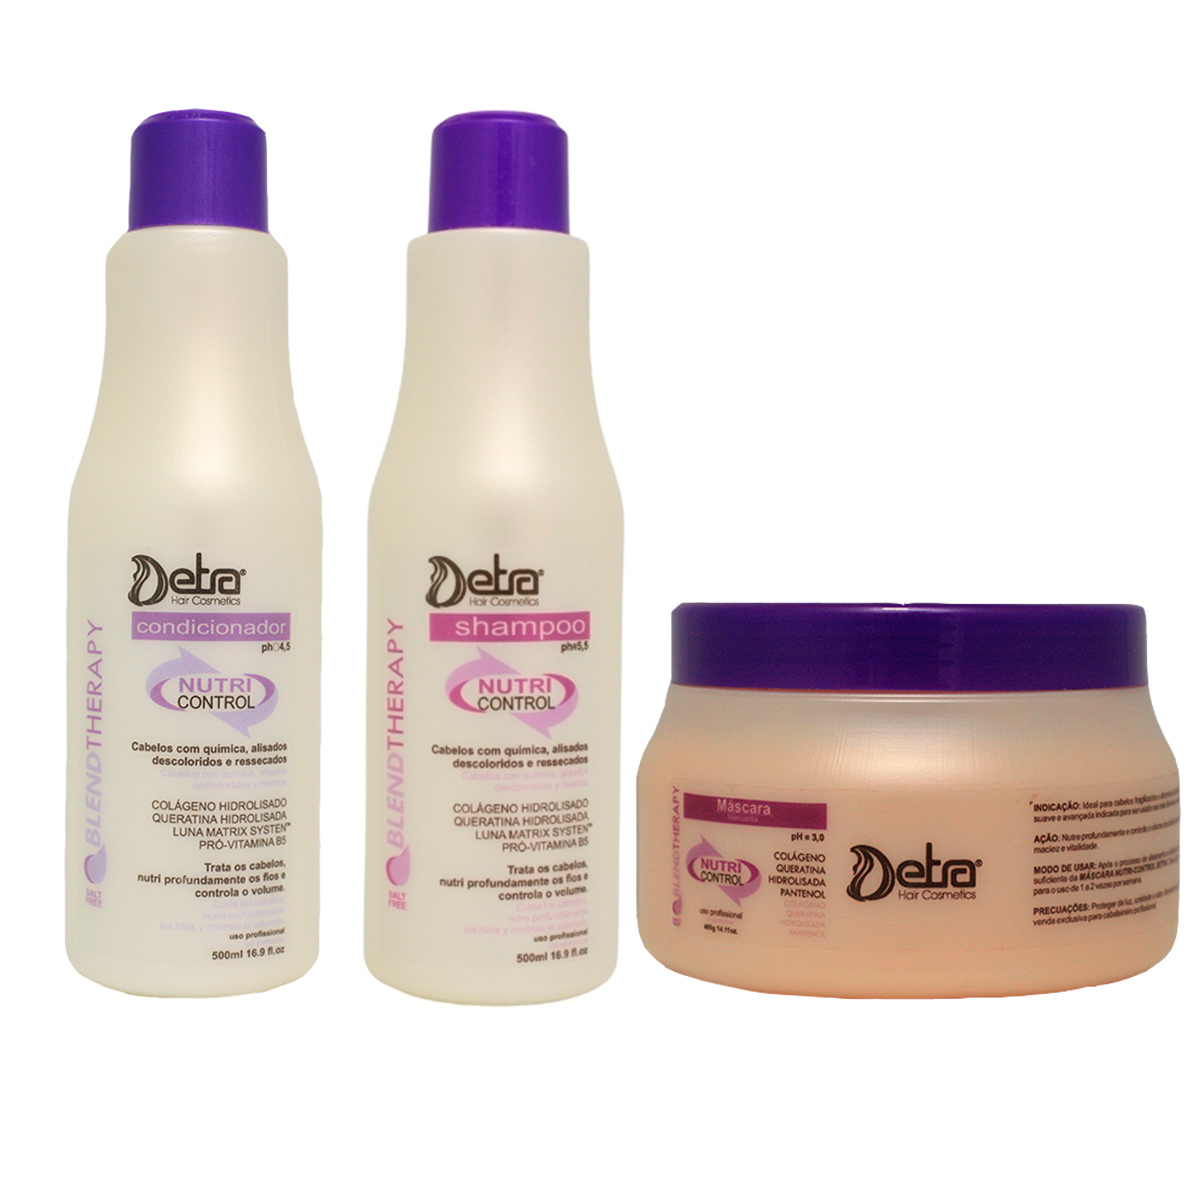 Detra Hair Cosmeticos Kit Capilar  Nutri Control